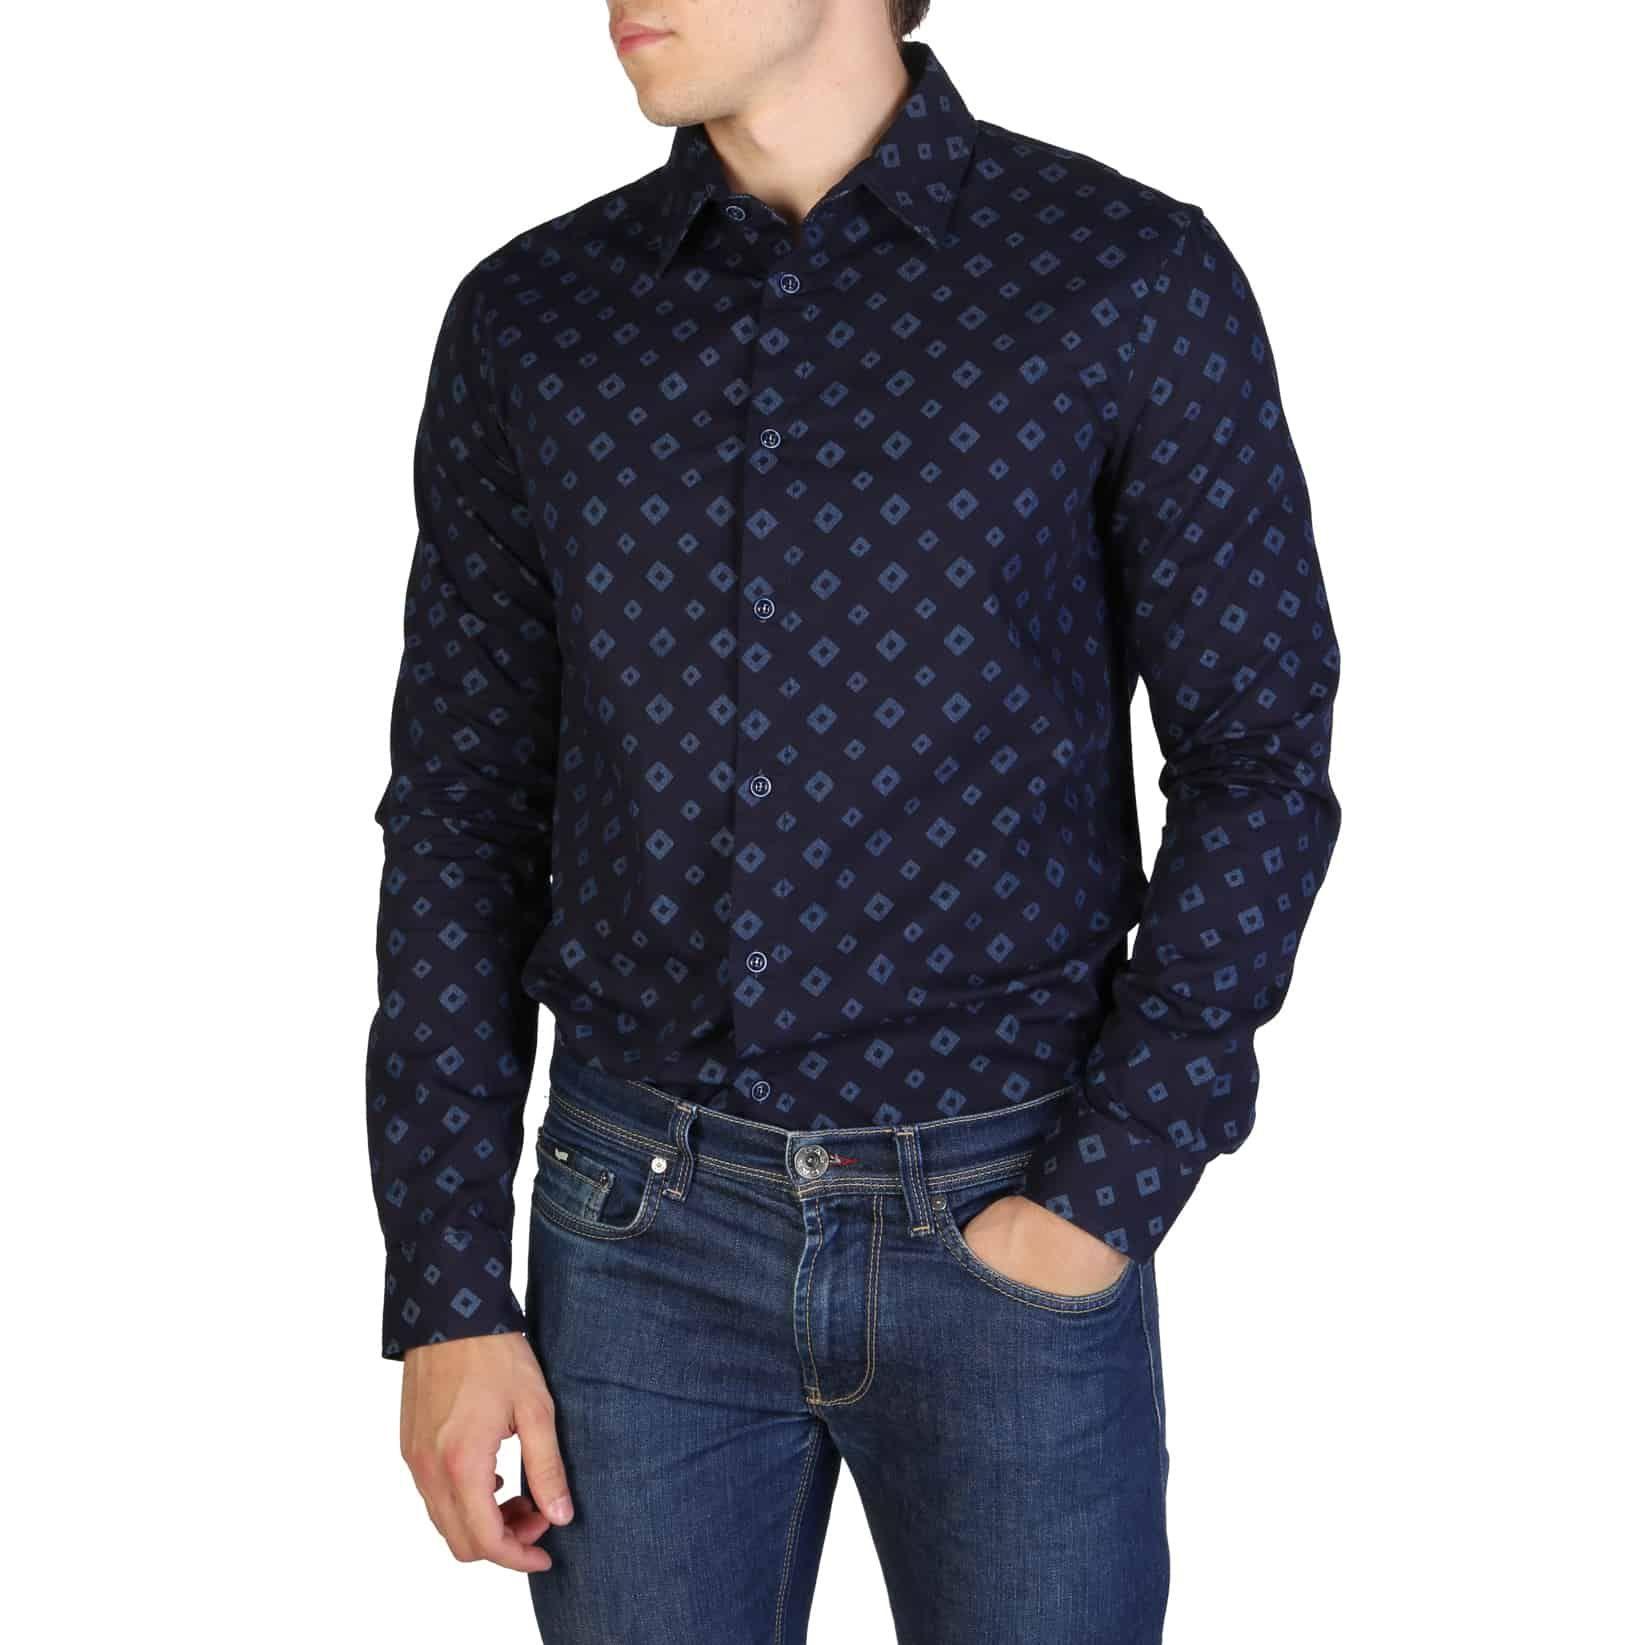 Armani Jeans – 6Y6C32_6N1PZ – Blu